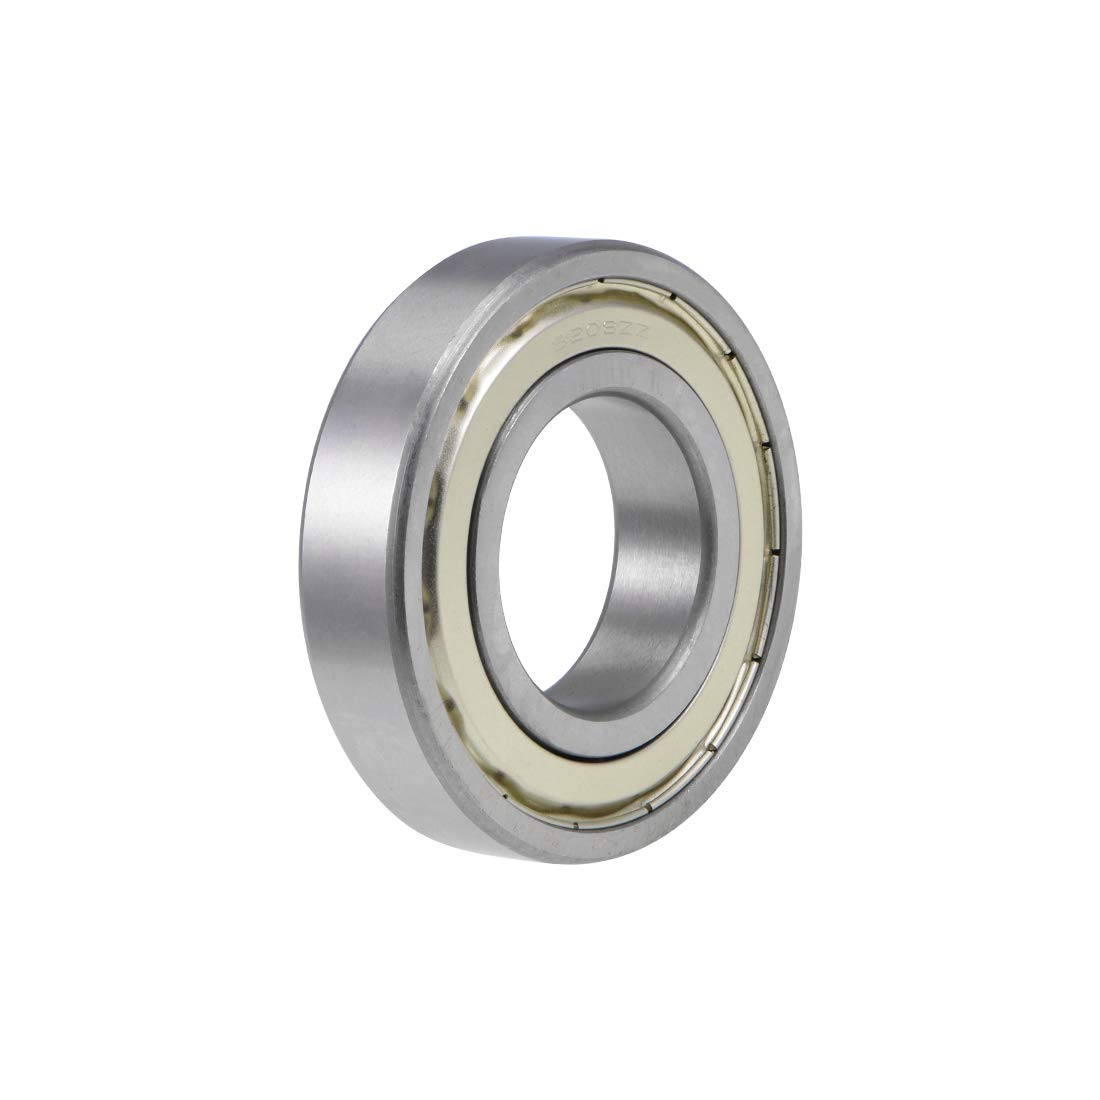 6208-ZZ Shielded Radial Ball Bearing,40x80x18mm